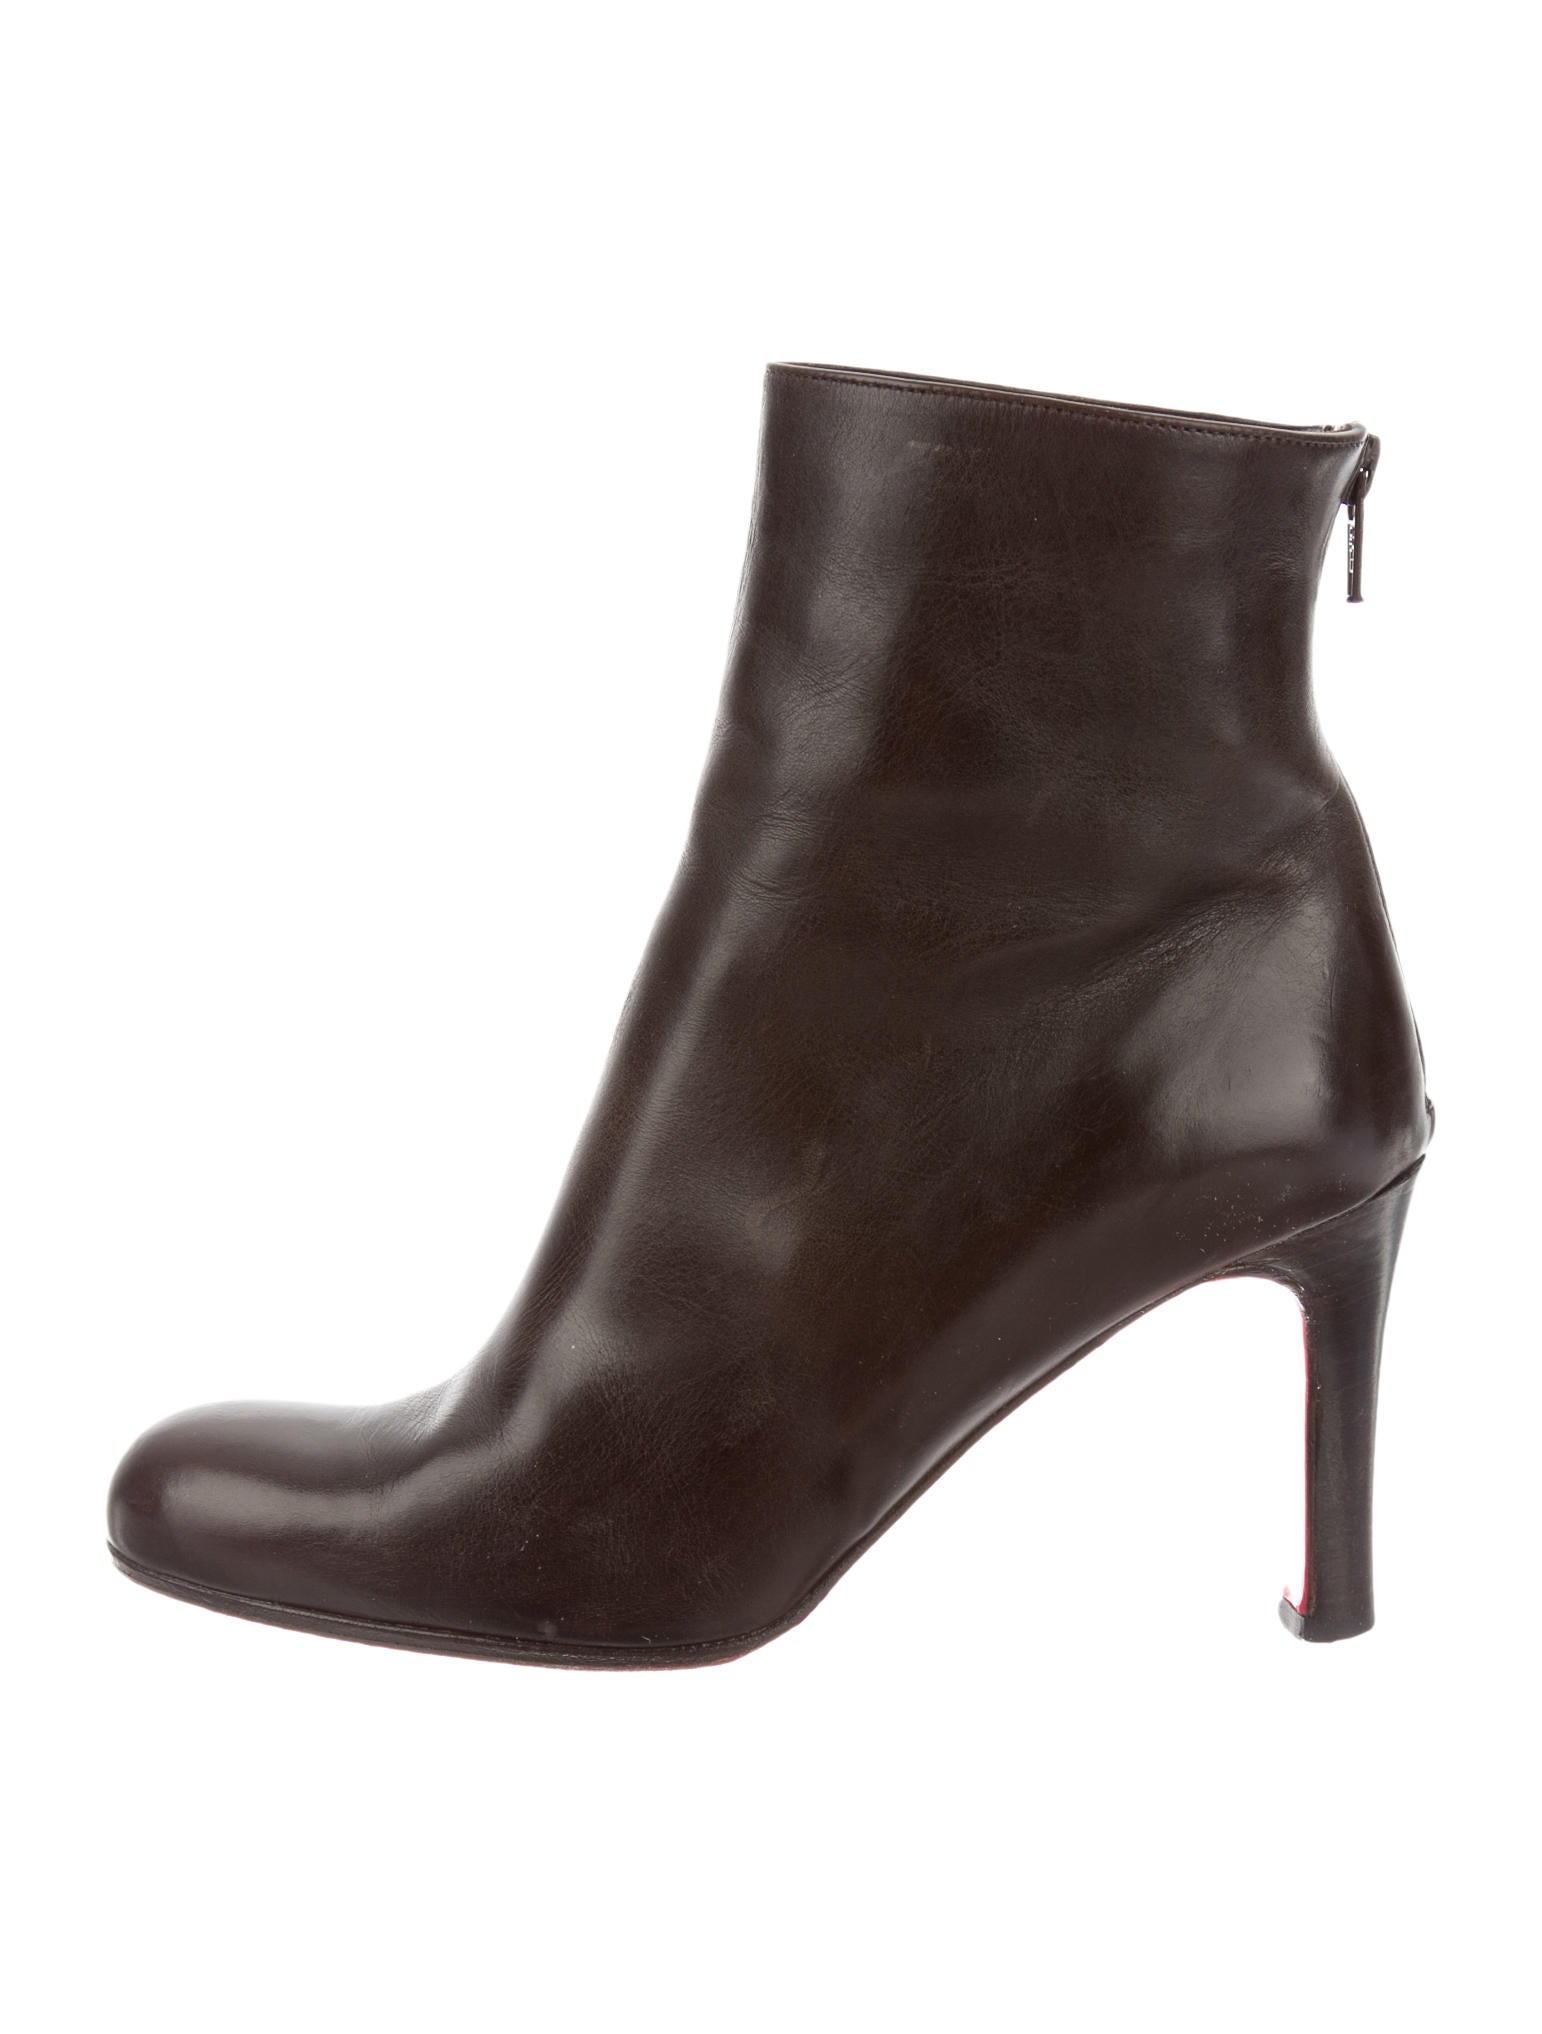 christian louboutin round-toe platforms boots